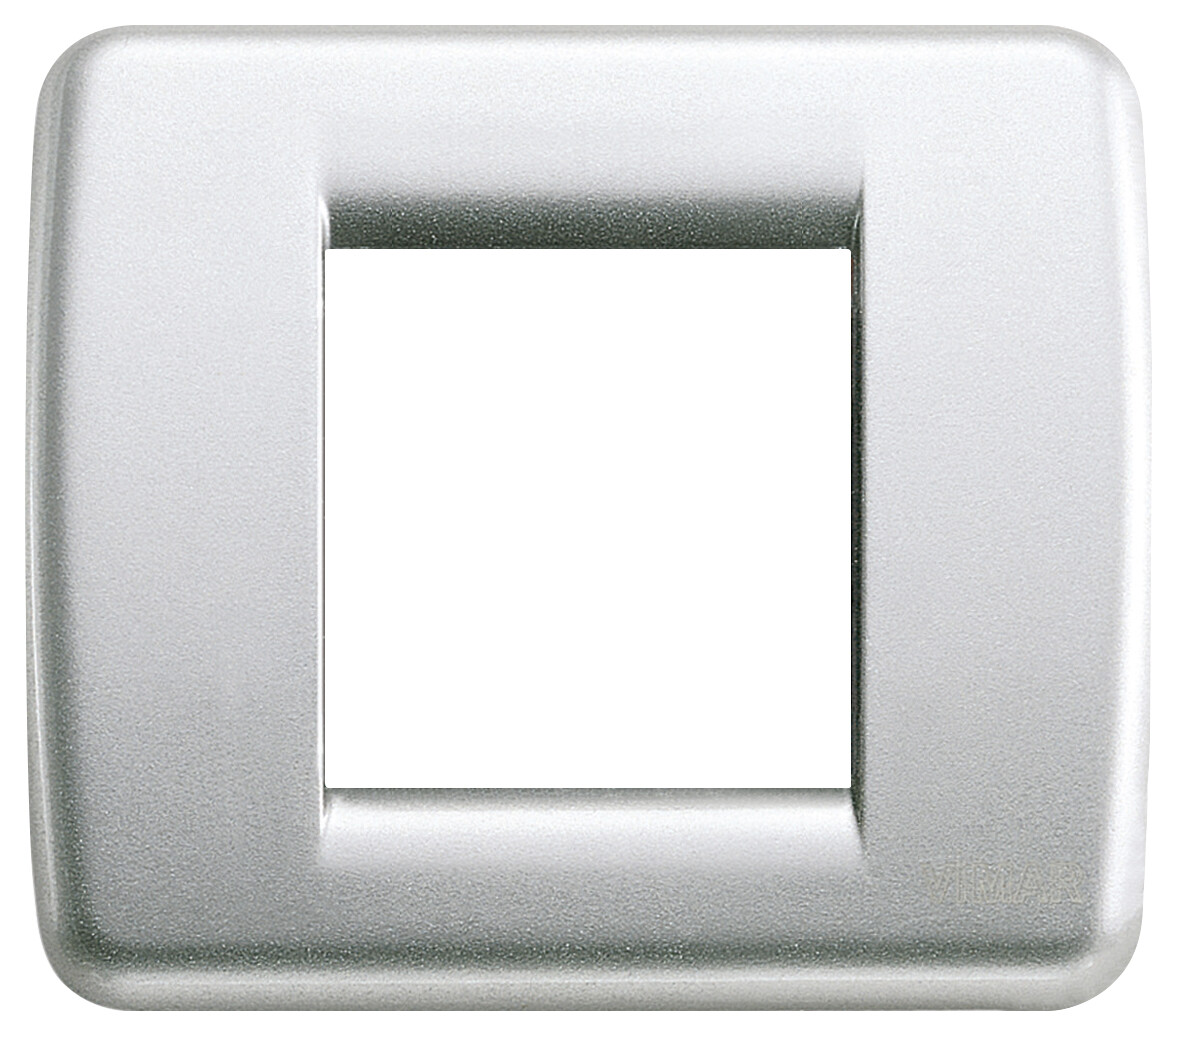 Накладка для 1-2 модулей RONDO металл металлик серебрянный